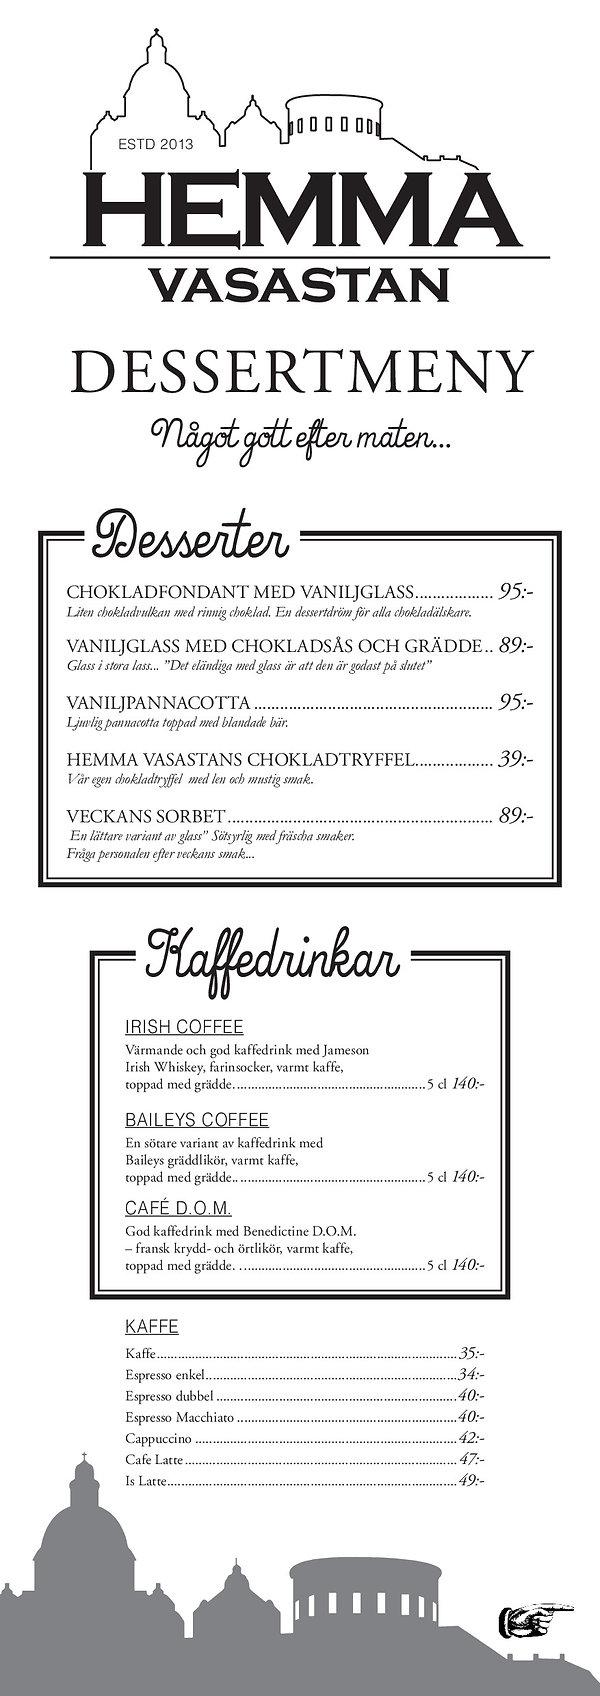 Vasatan Dessertmeny_2021_web.jpg_001.jpg